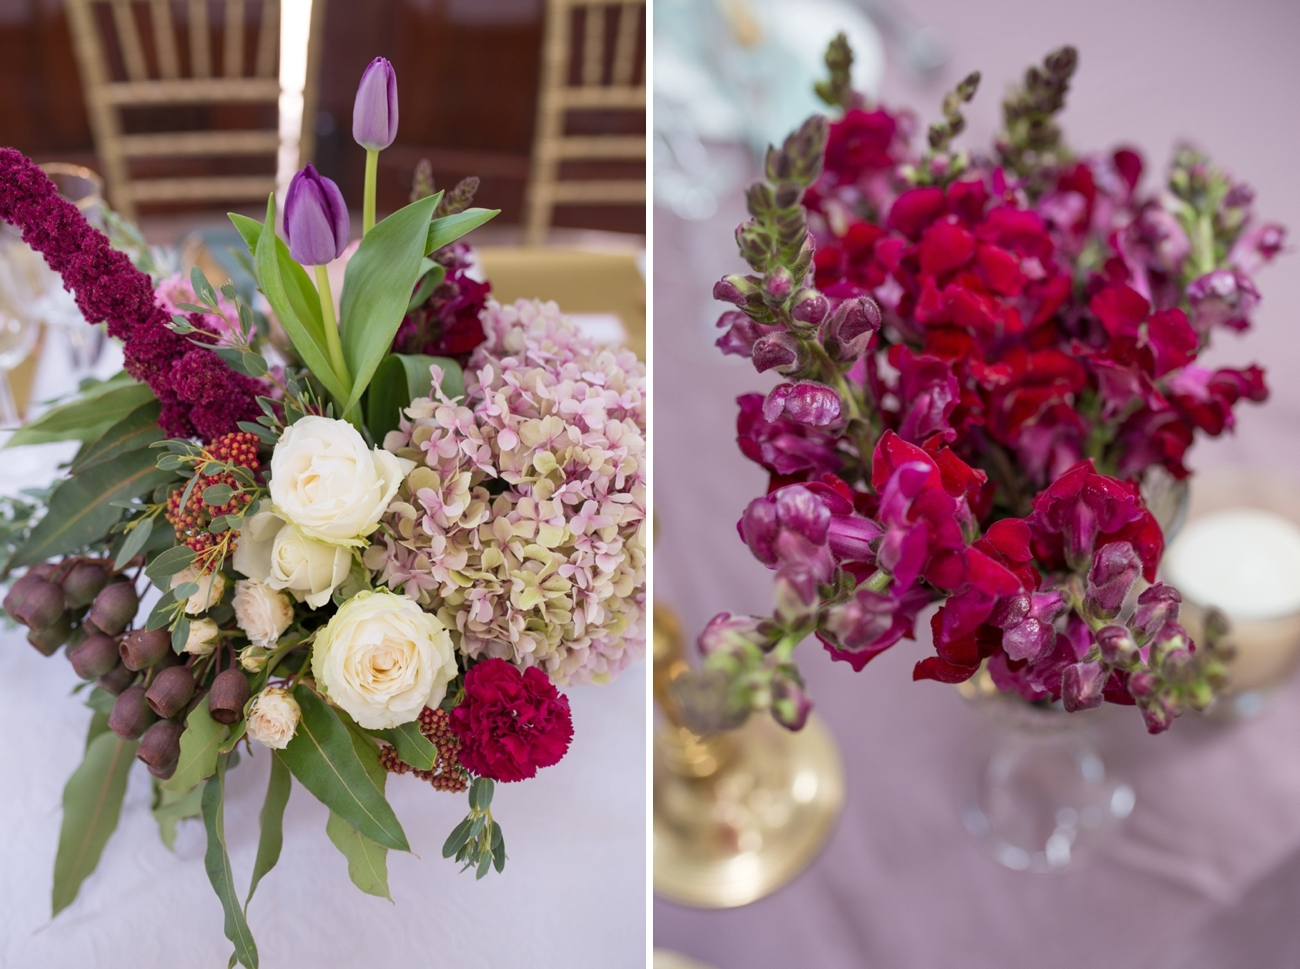 Berry Tone Florals | Credit: Cheryl McEwan